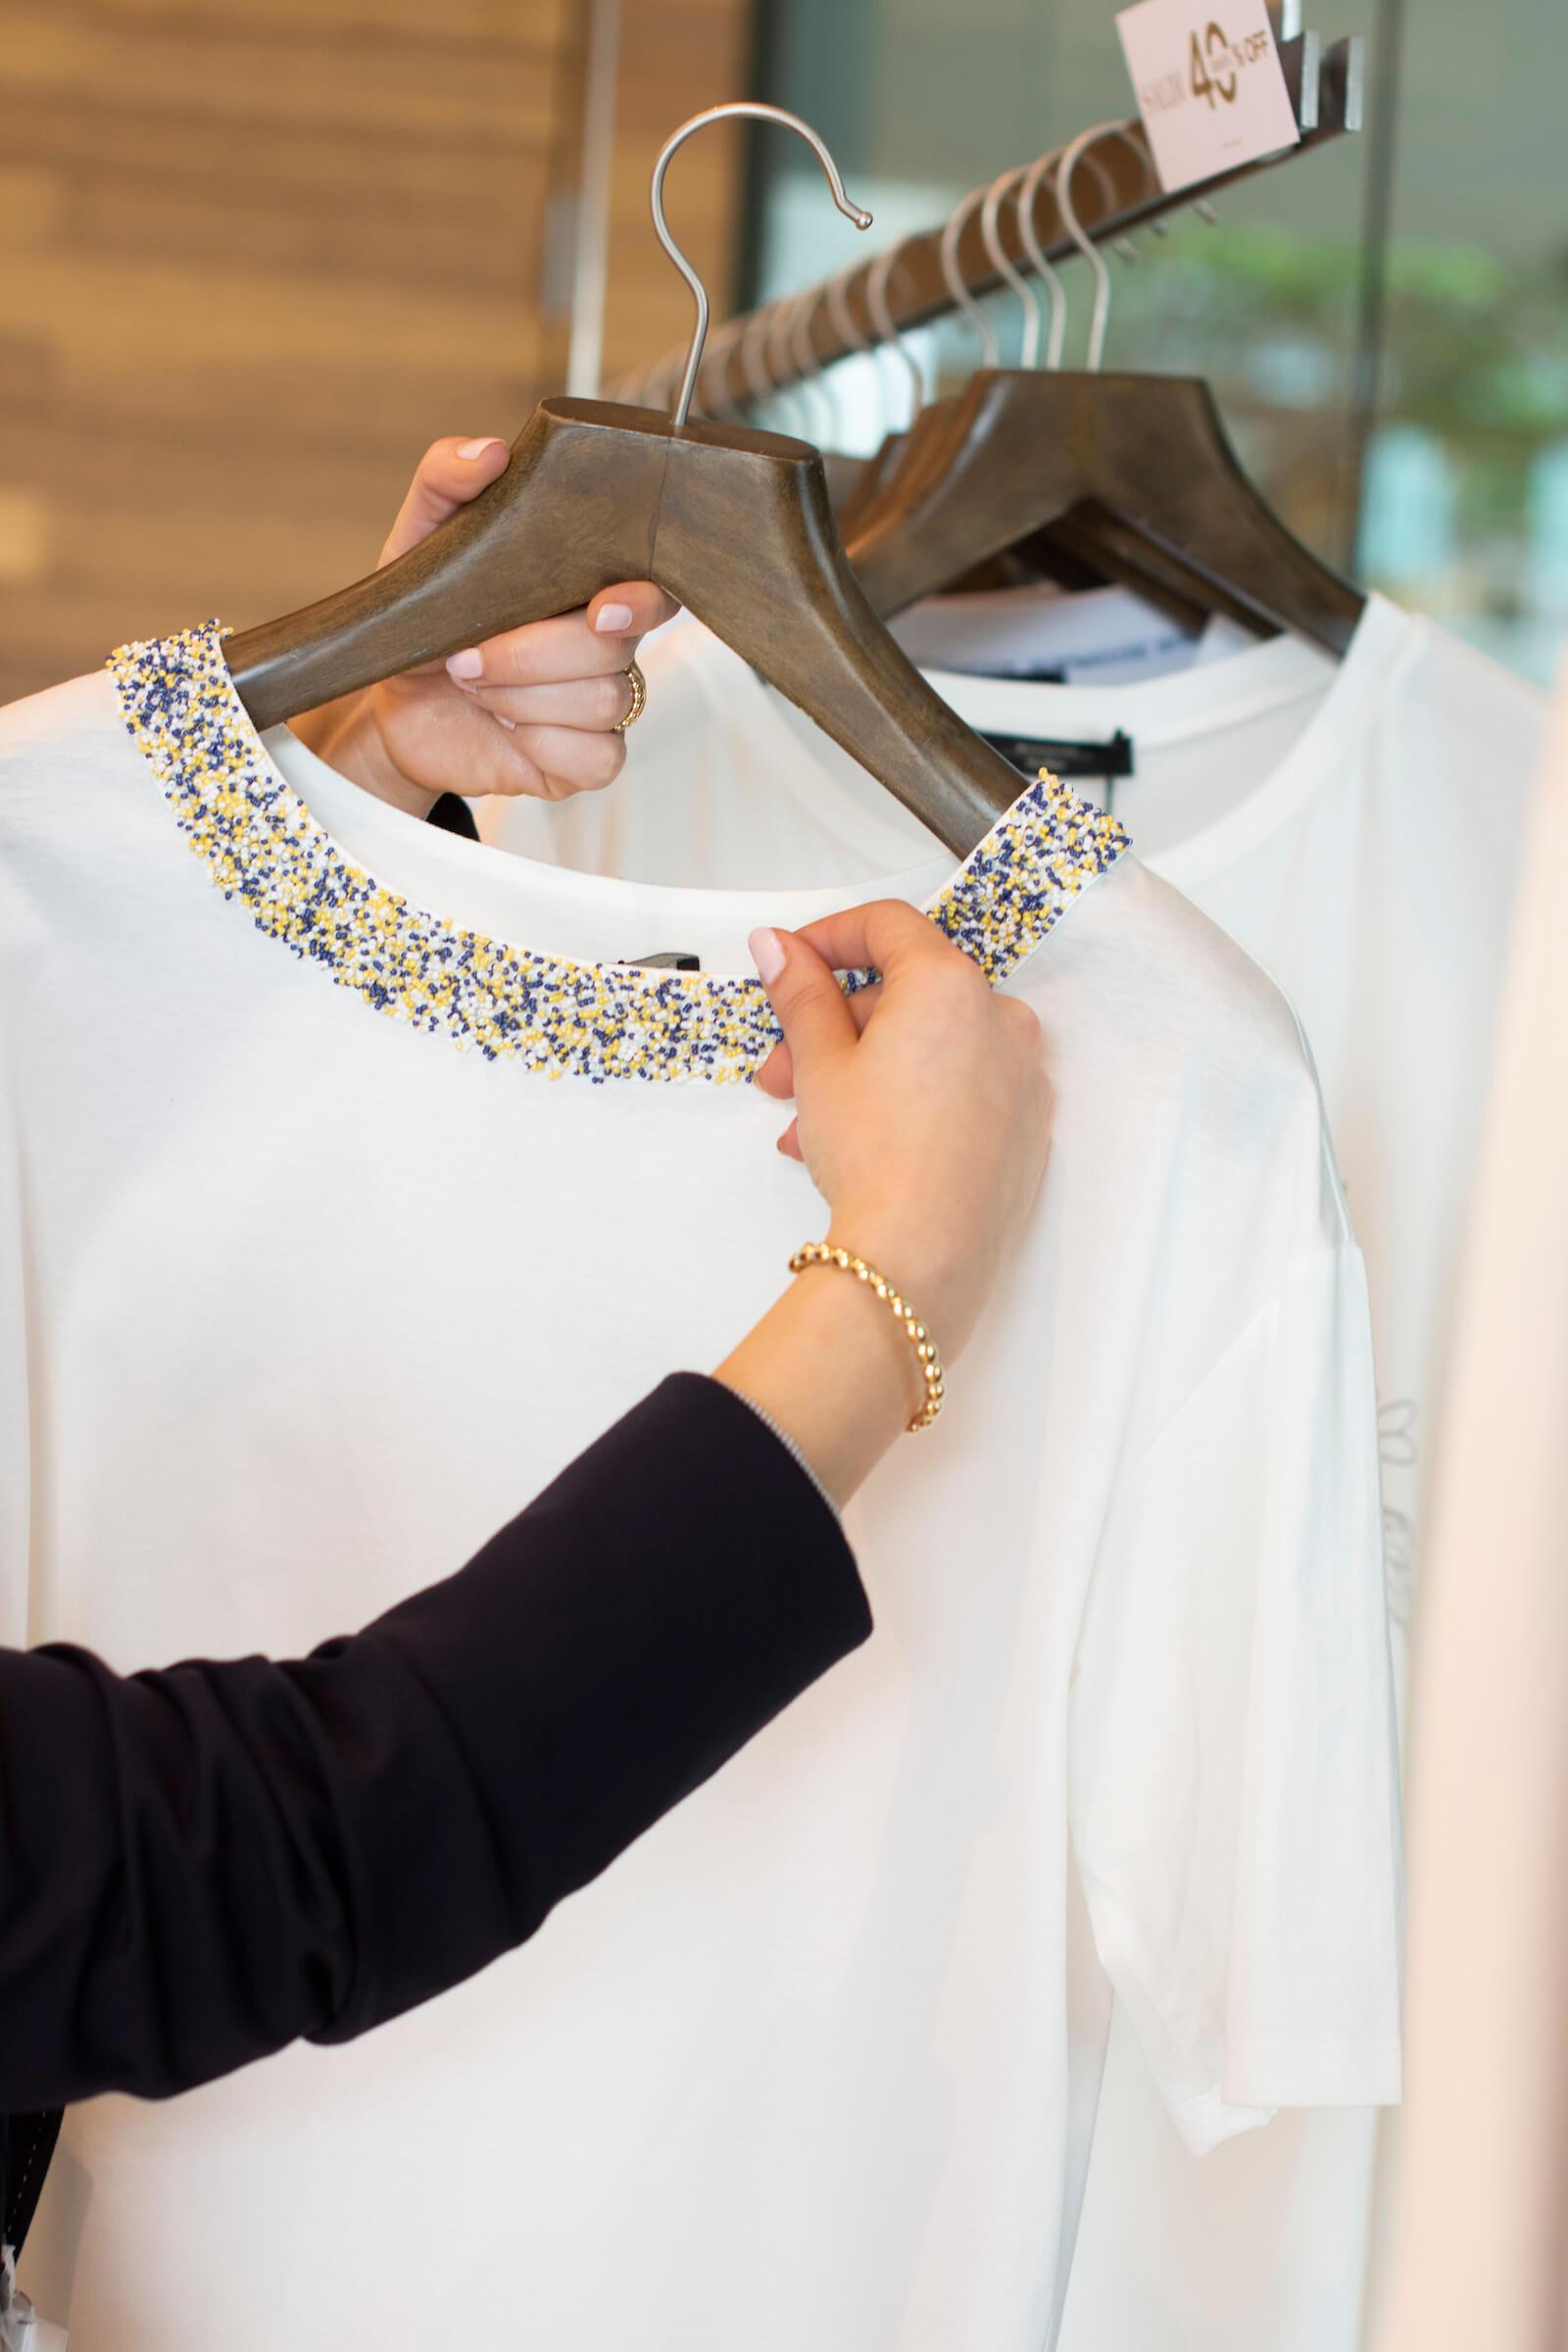 Modelo vestido blanco - Styling Room